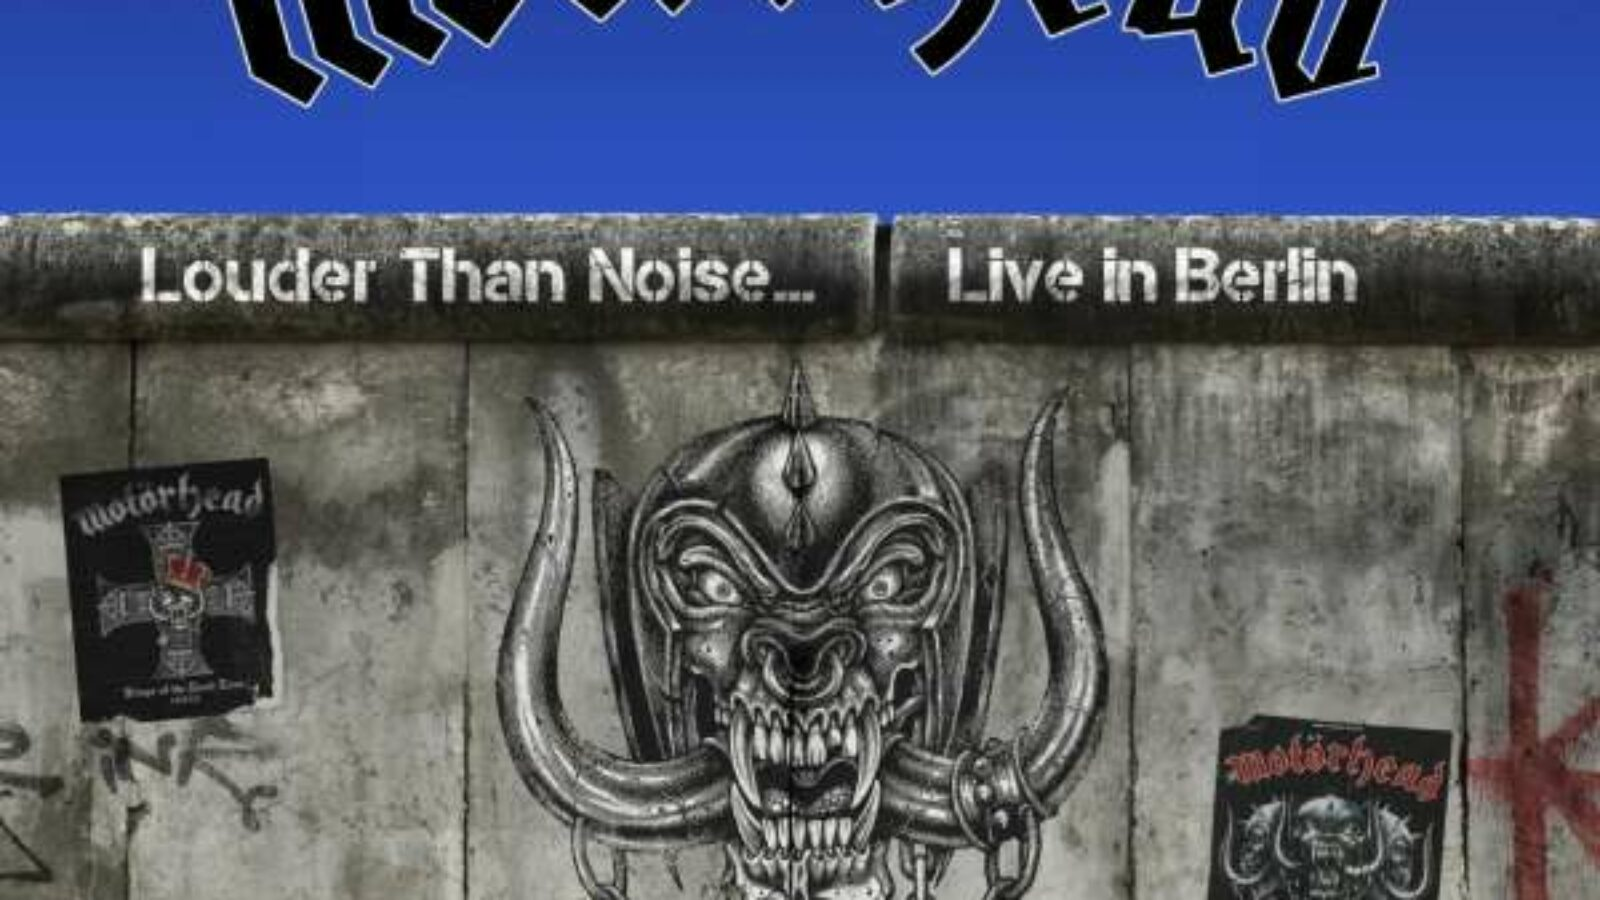 NEU: Motörhead, While She Sleeps, Tom Jones